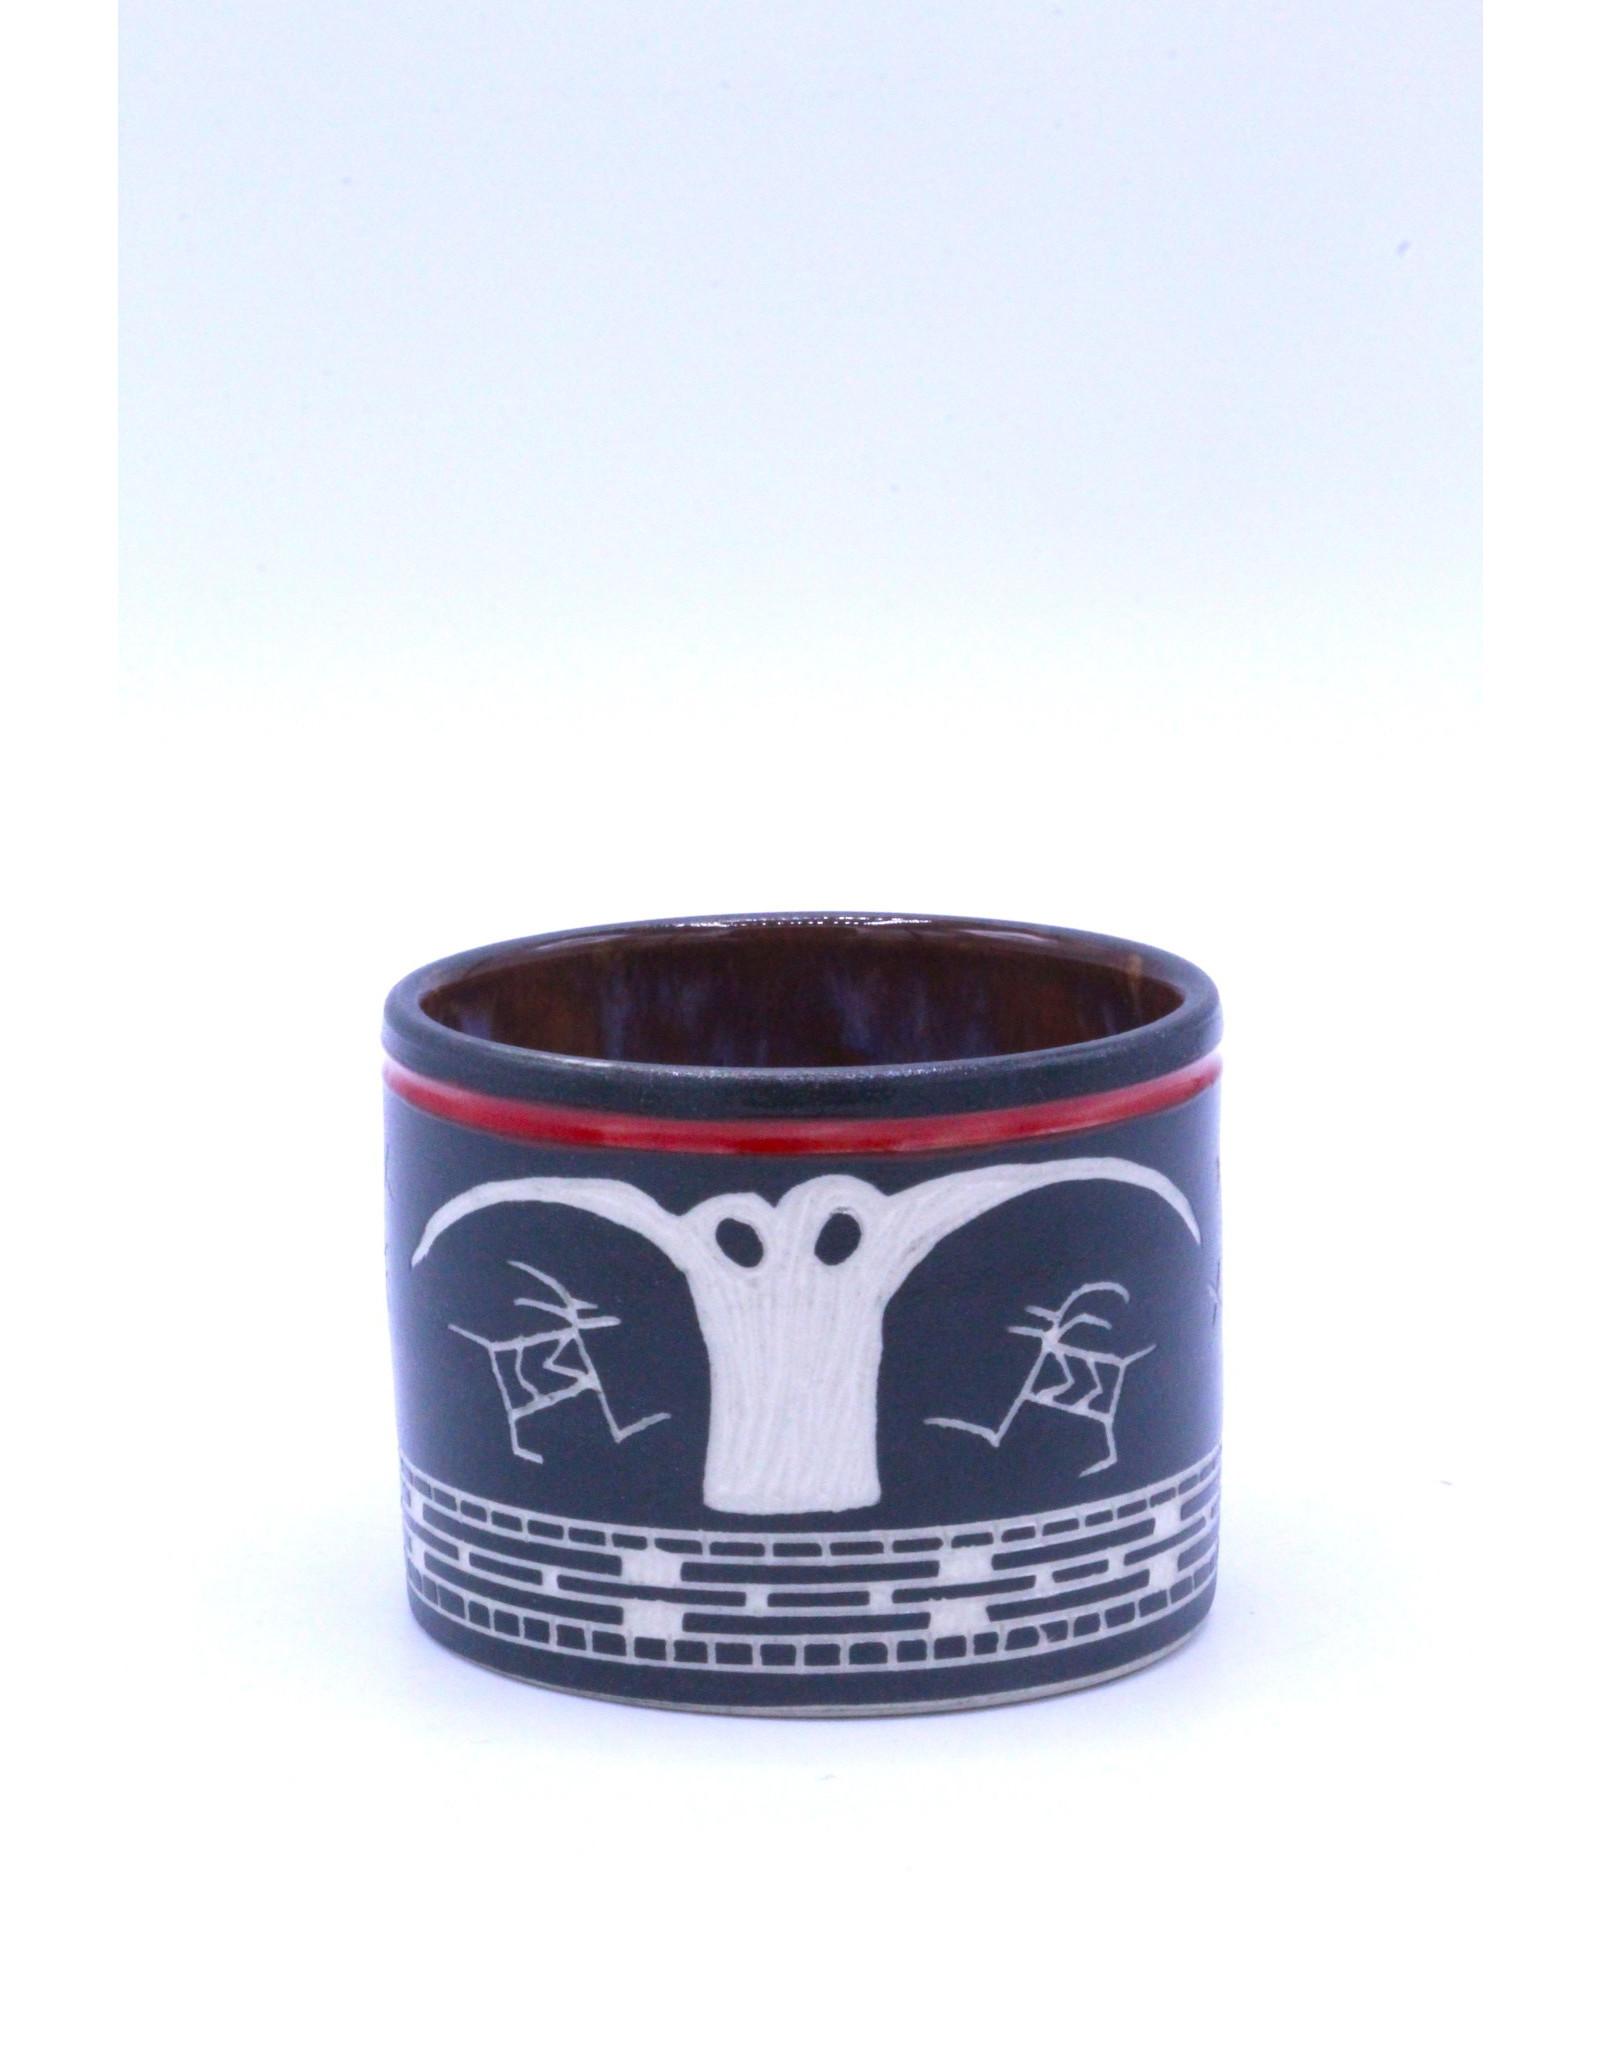 Pottery - #0068